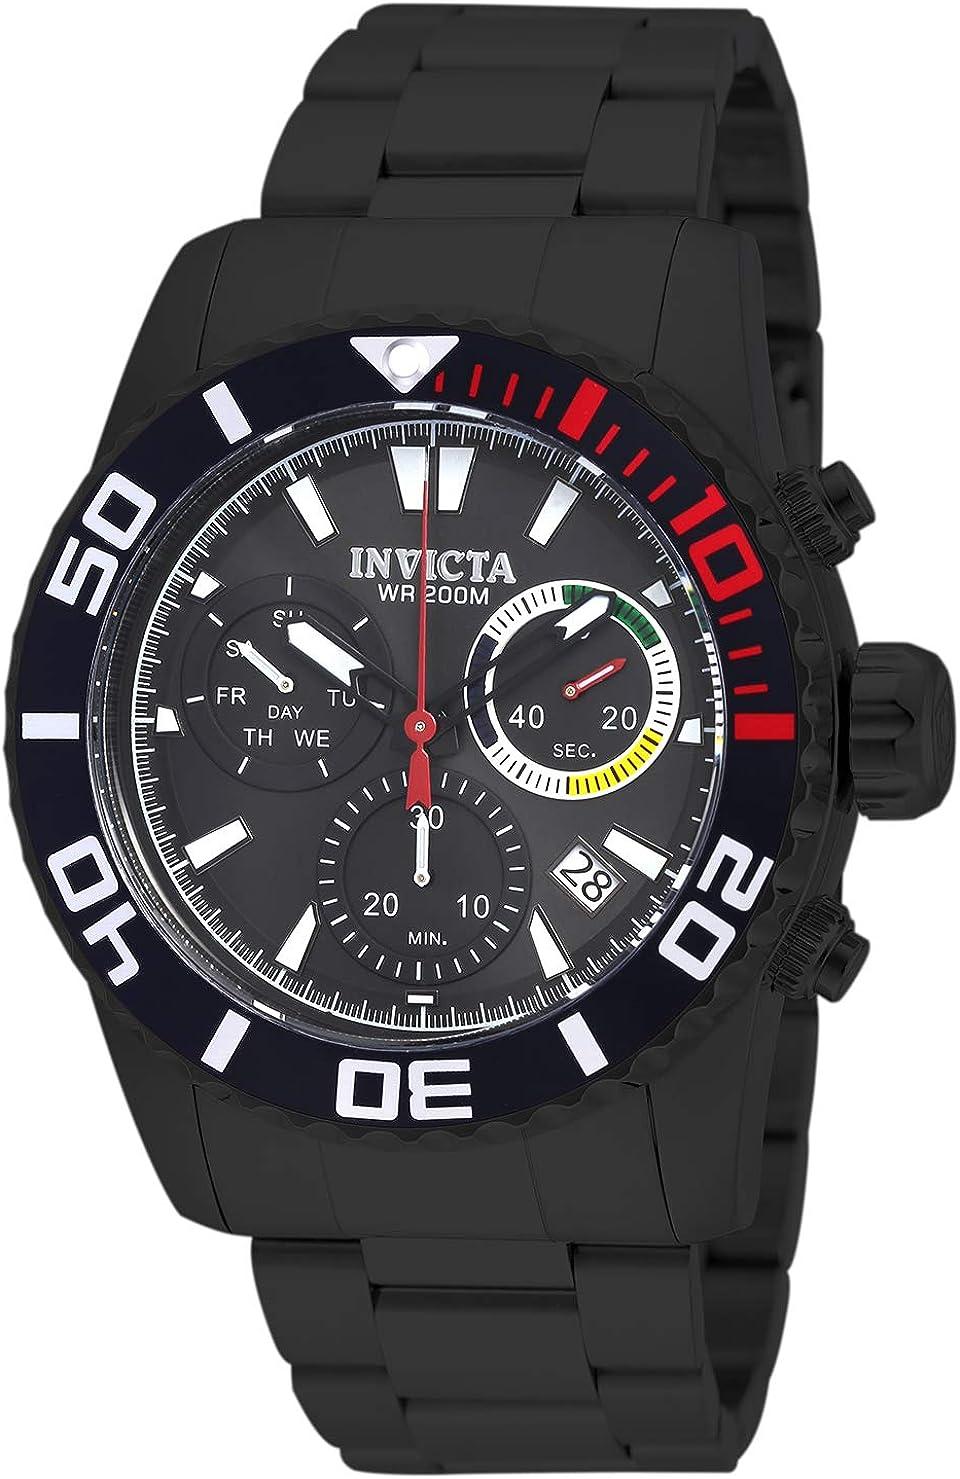 Invicta Reloj para hombre 18940 Pro Diver analógico, cuarzo suizo, color negro